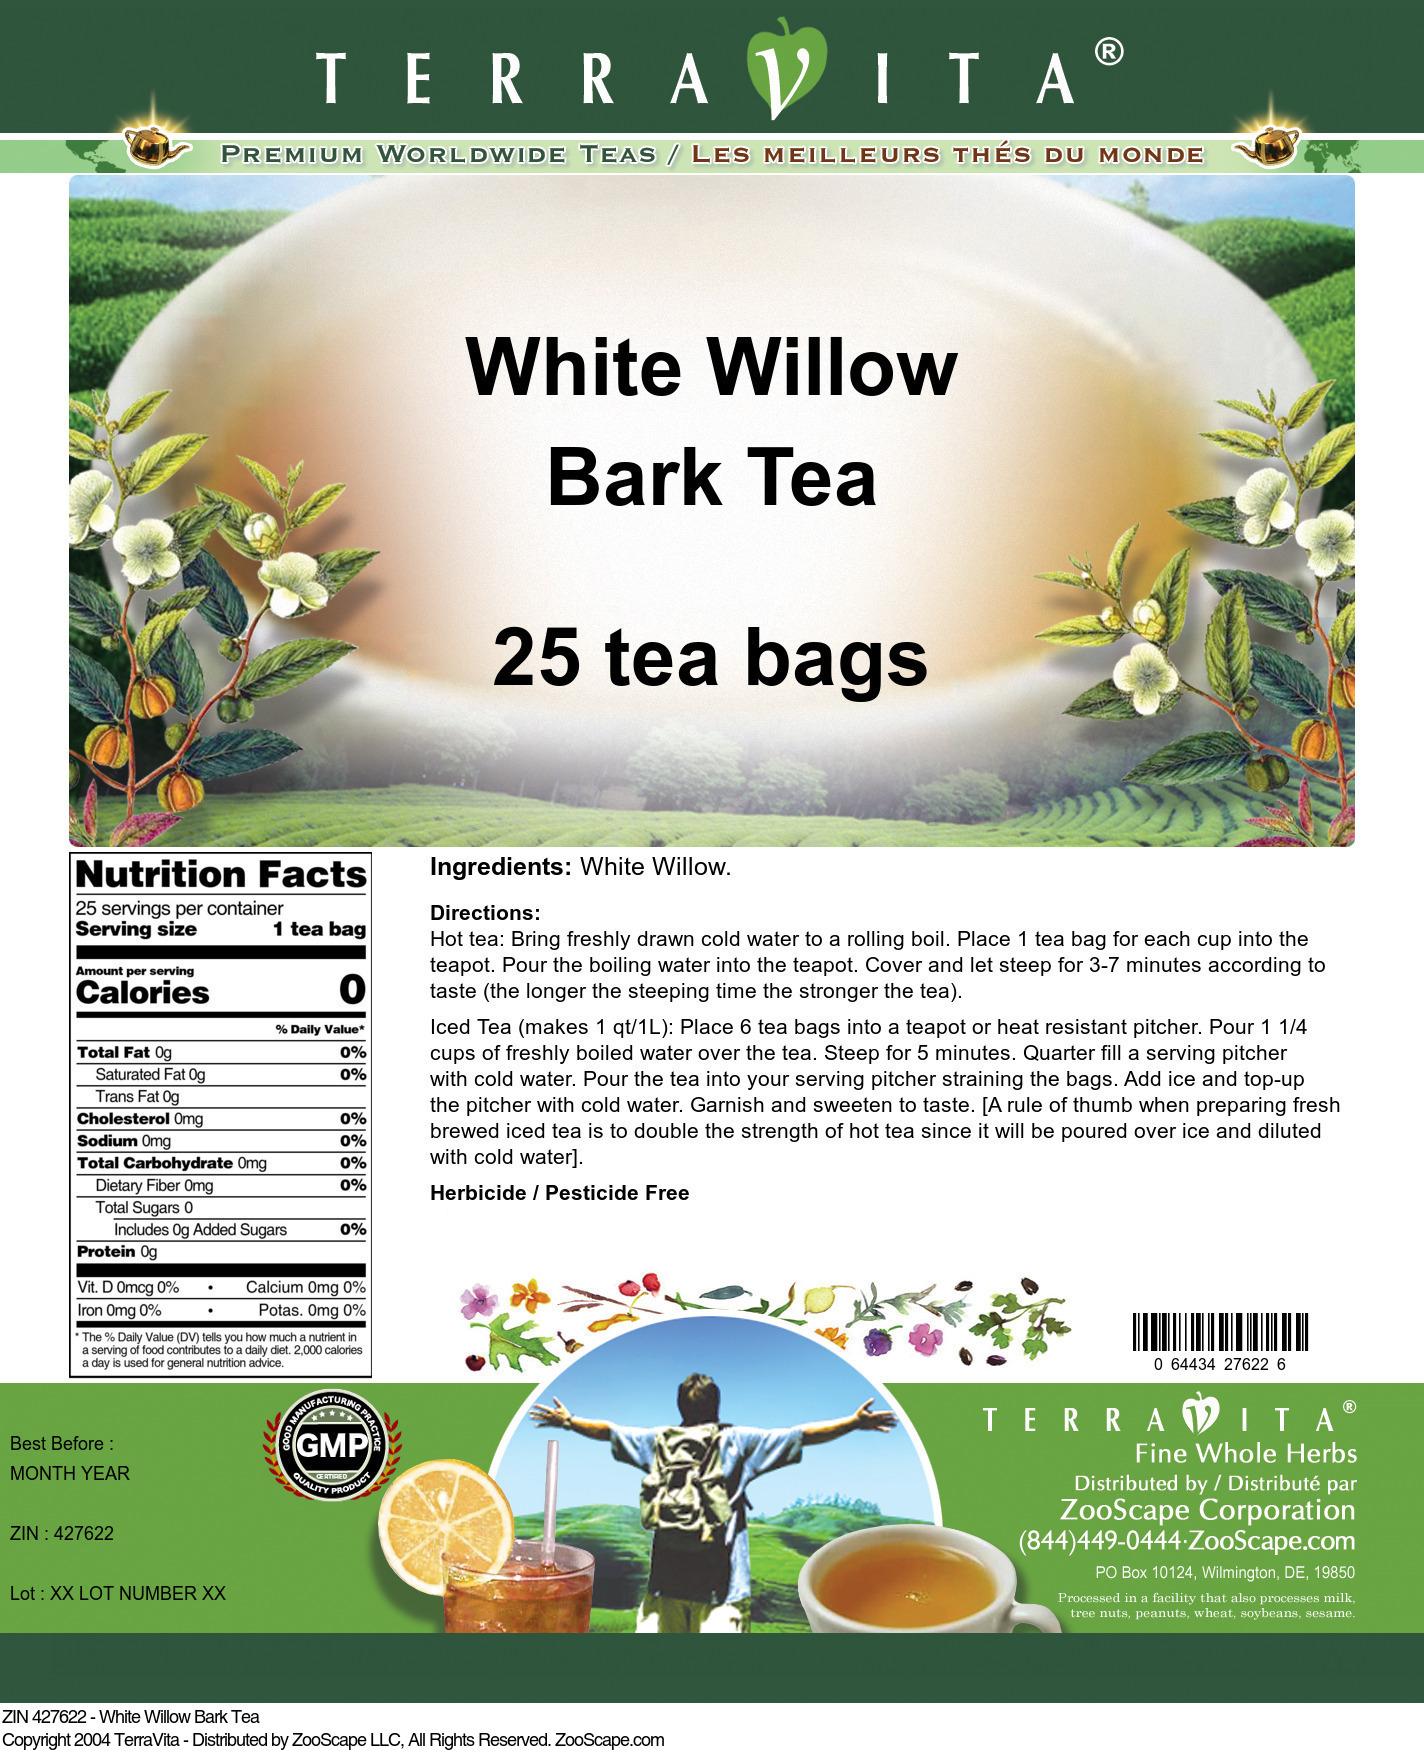 White Willow Bark Tea